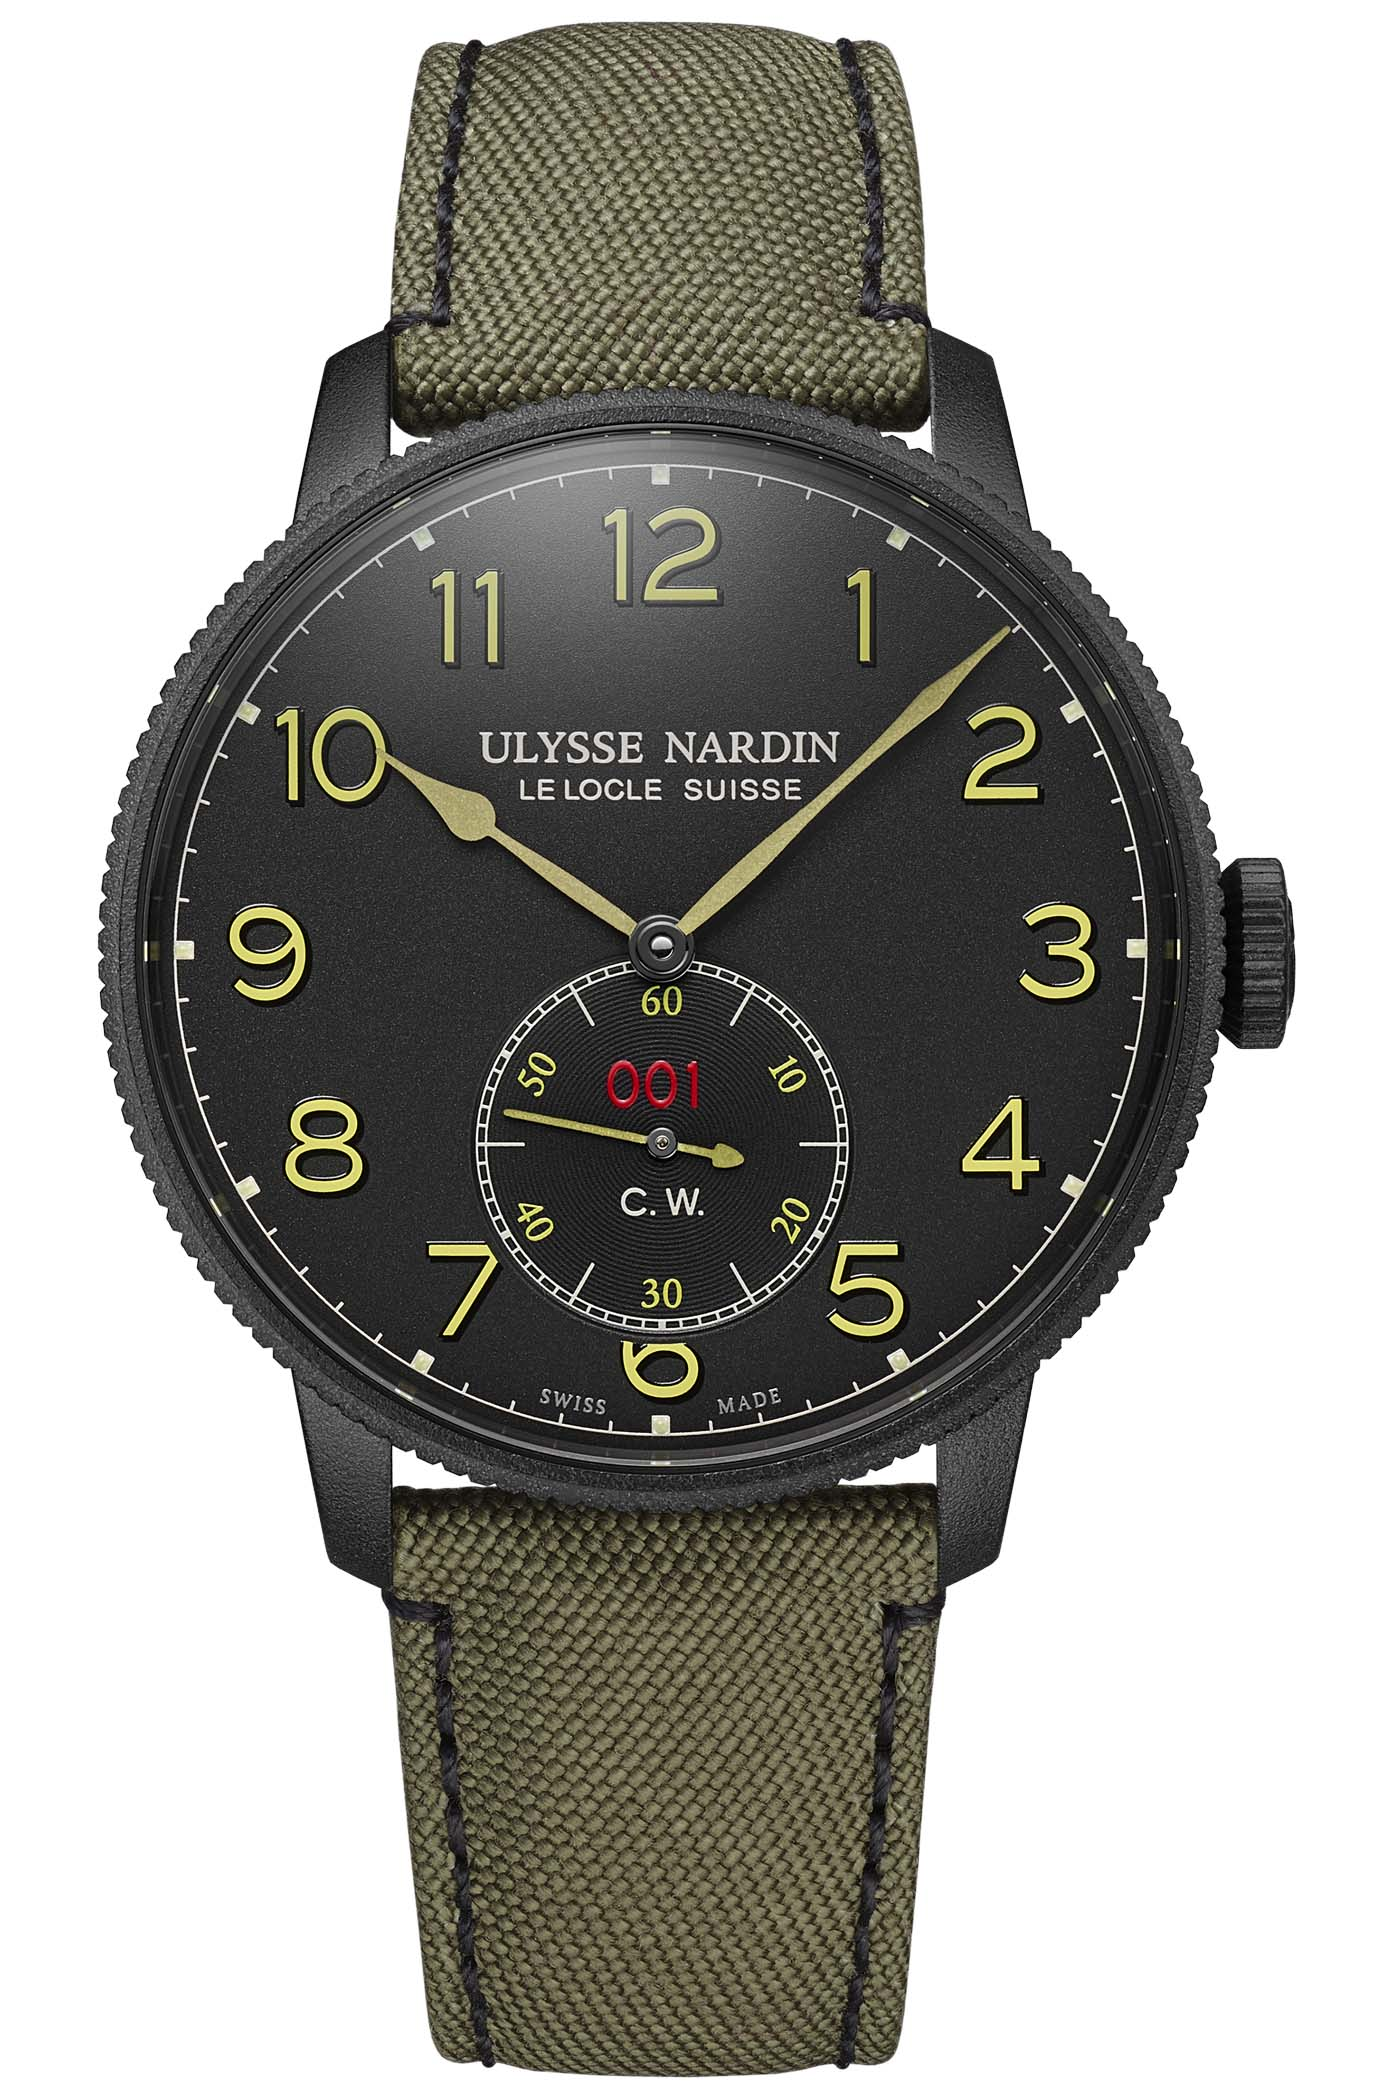 Ulysse Nardin Marine Torpilleur Military Black-and-Khaki - 1